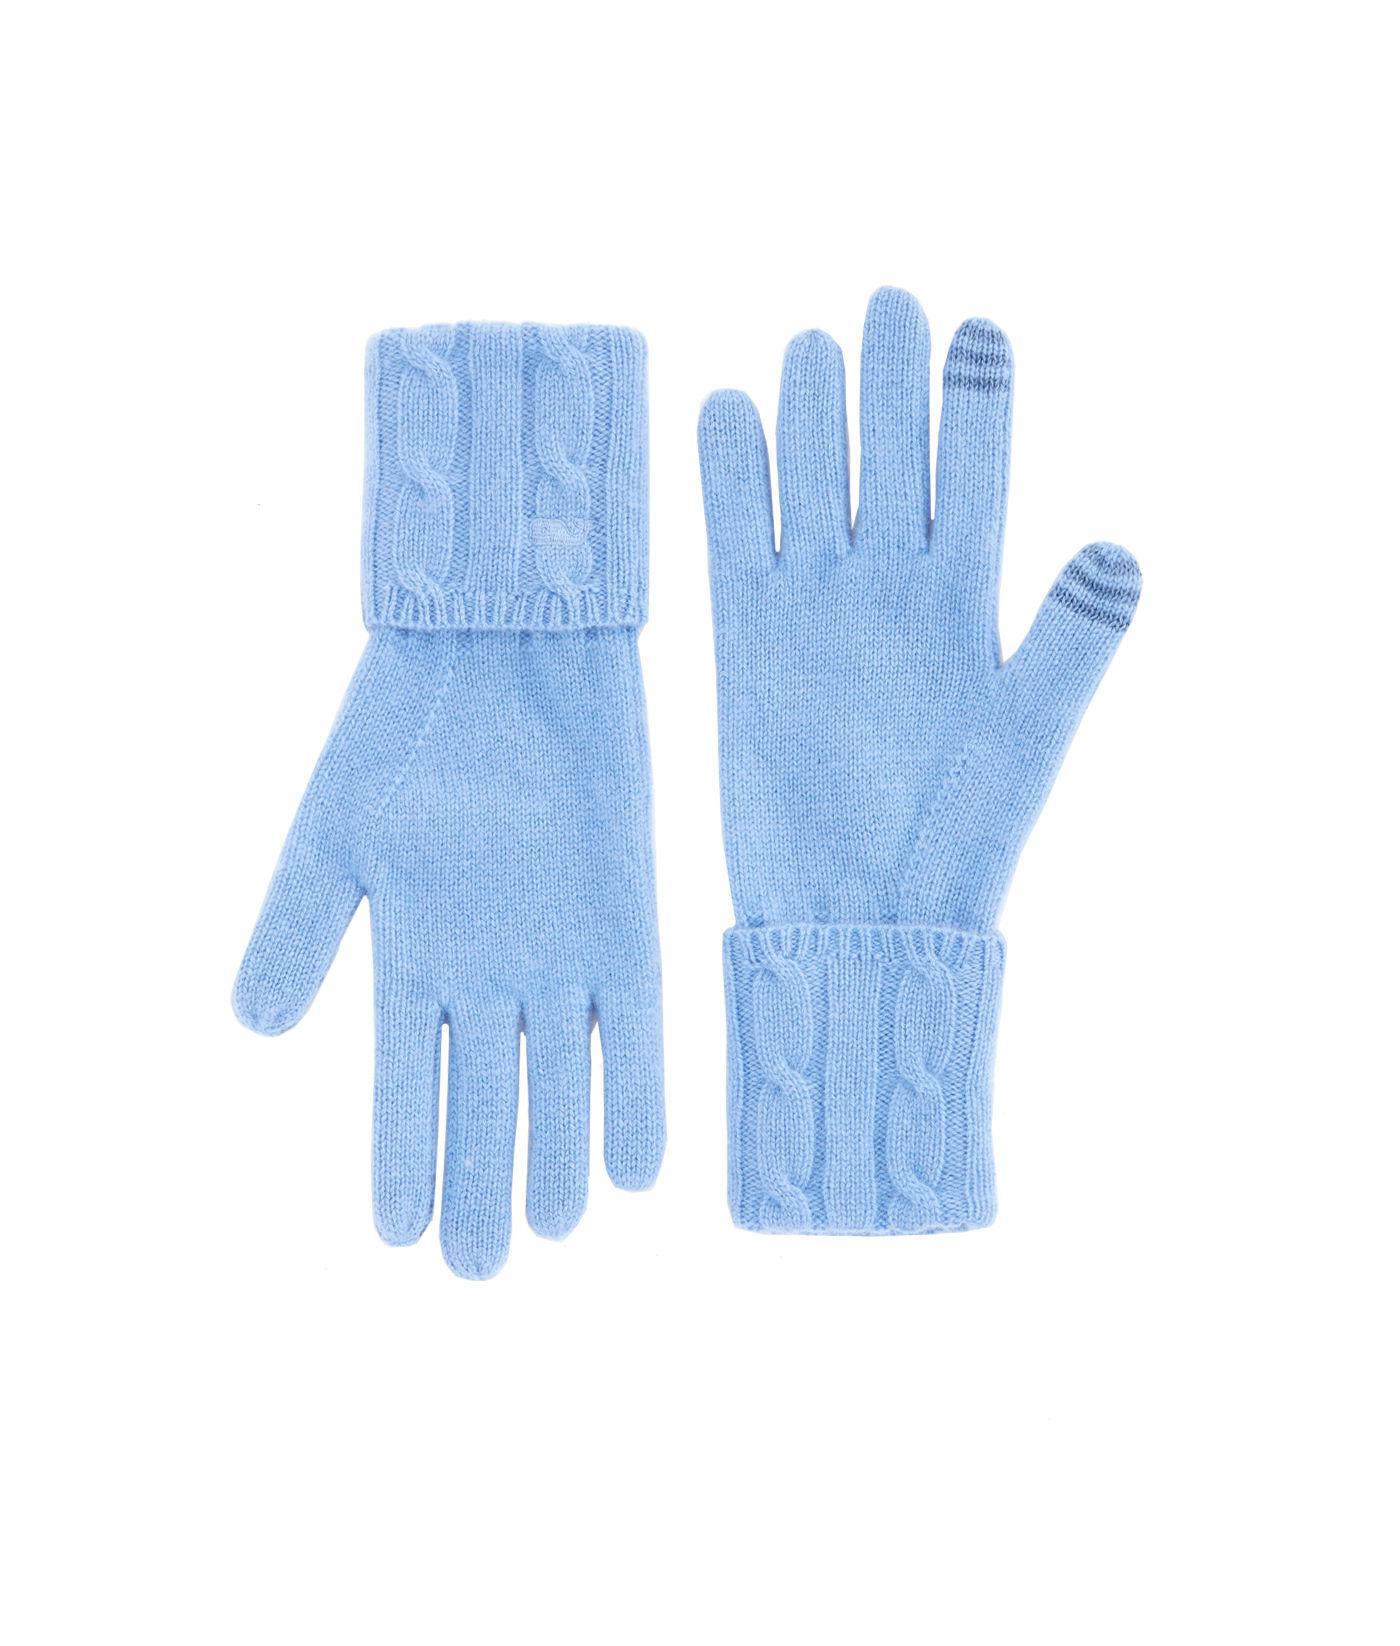 2f189c904 Vineyard Vines Cashmere Coral Lane Knit Texting Gloves in Blue - Lyst